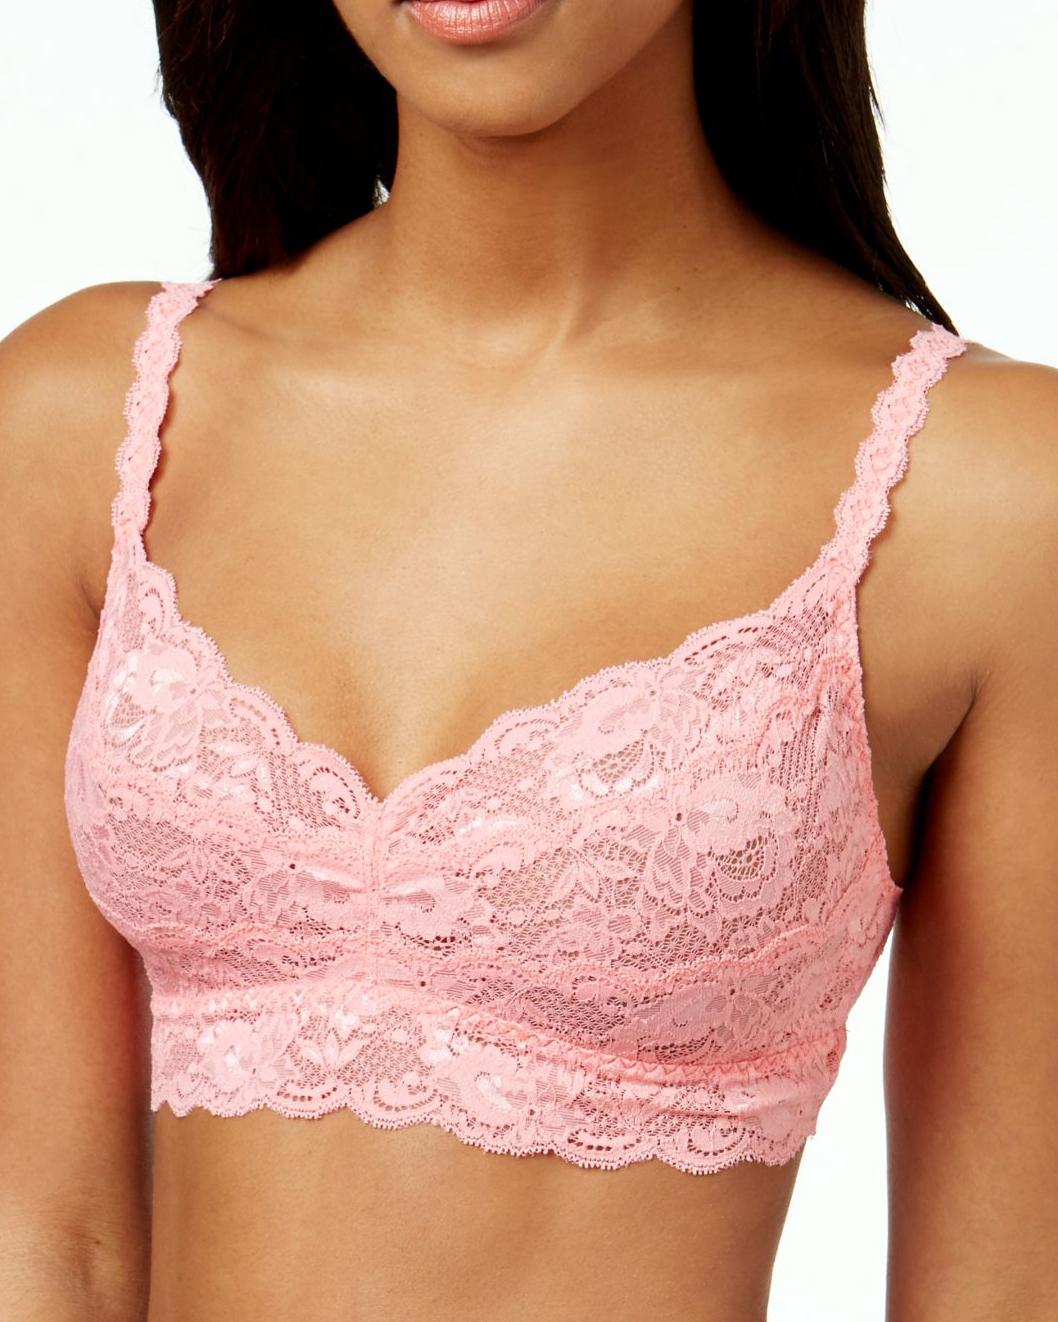 Pink-Lace-Surgical-Bra-Lingerie-Store-The-Dain-Shoppe-Morristown-NJ.jpg